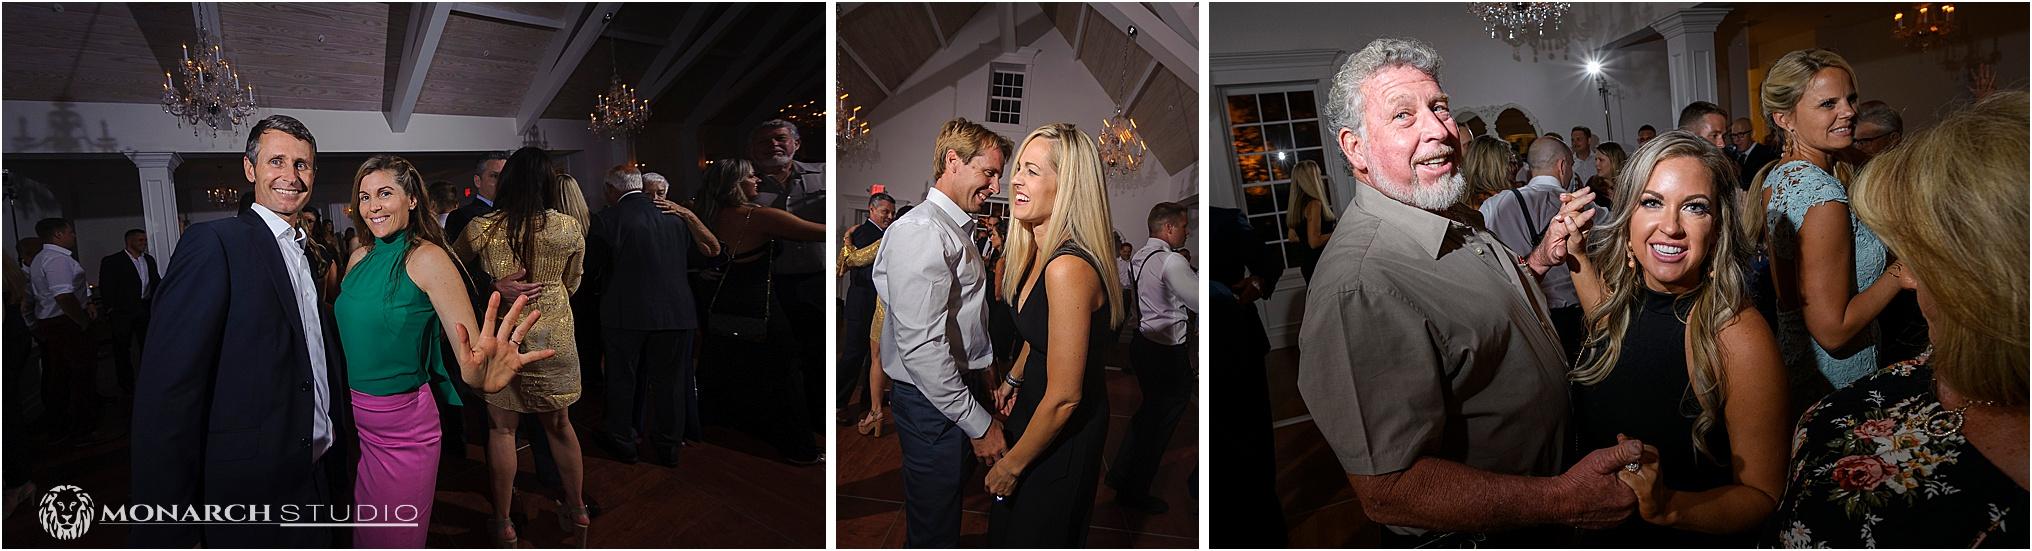 118-whiteroom-wedding-photographer-2019-05-22_0100.jpg